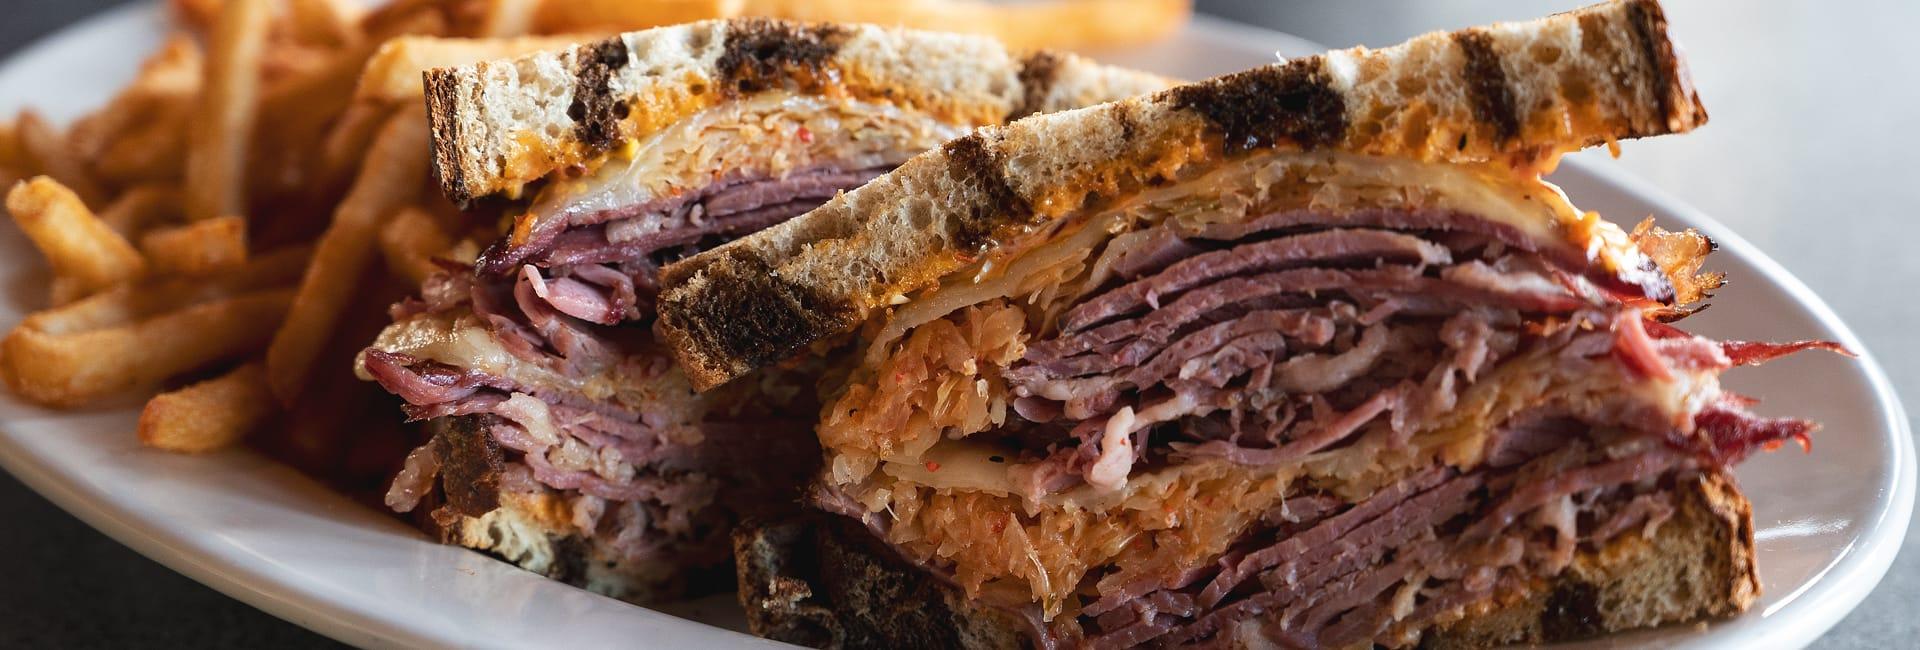 Clyde Iron Works reuben sandwich